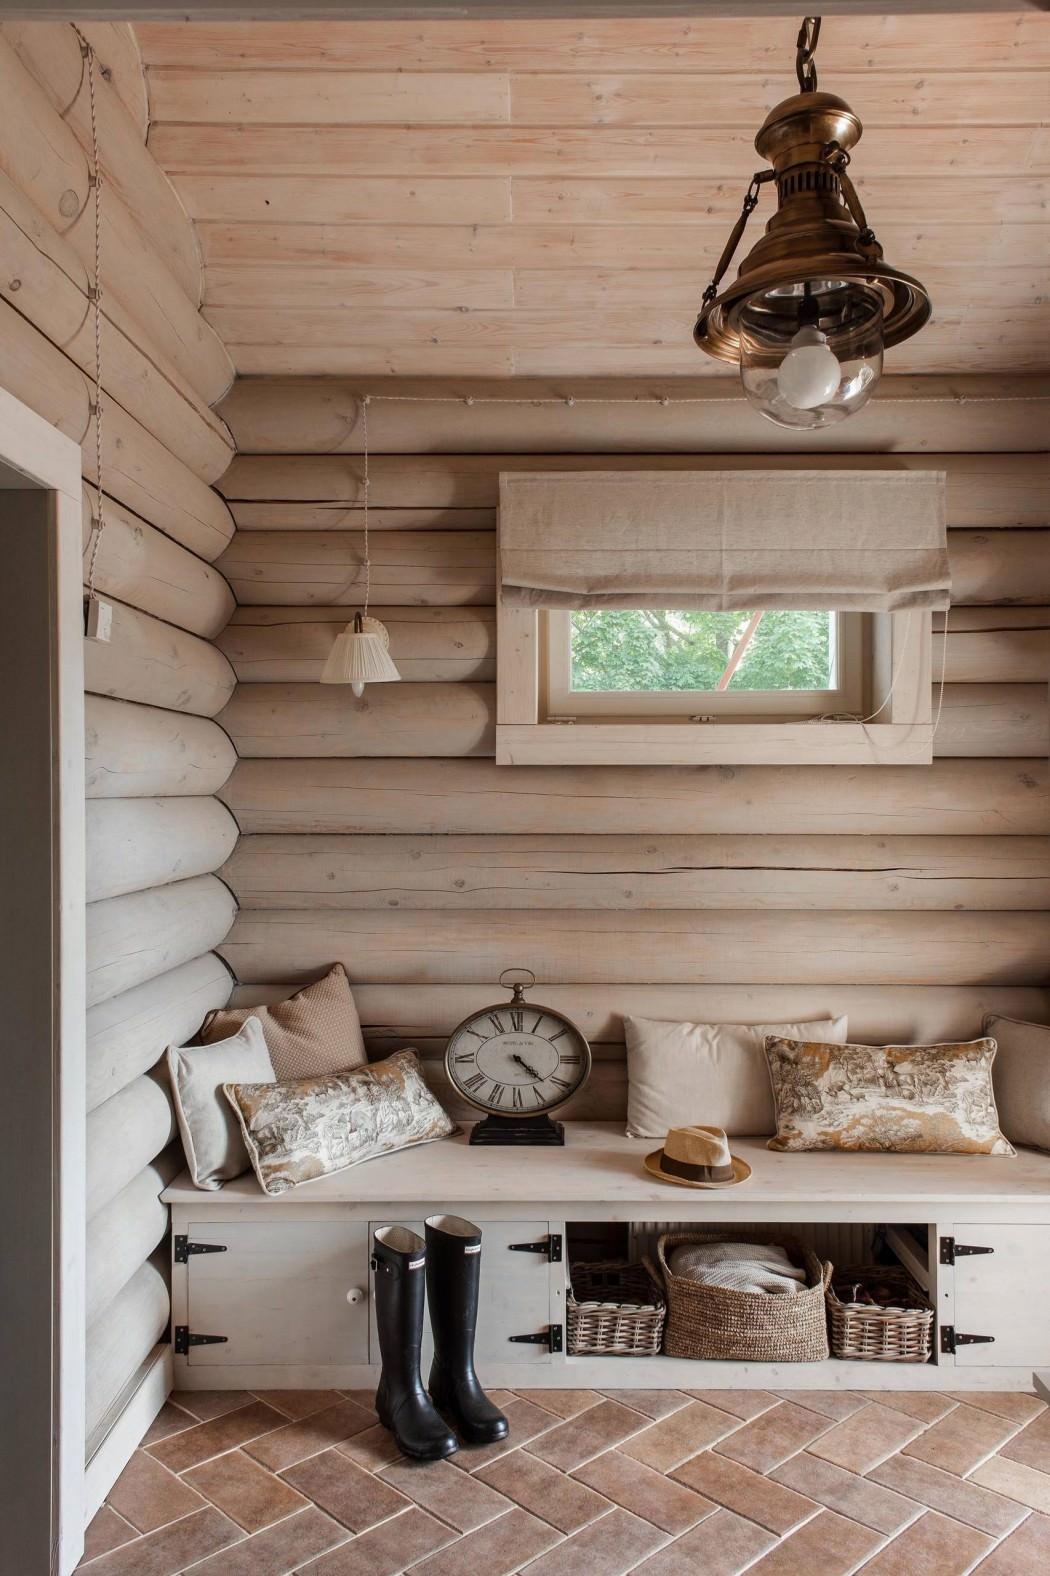 Summer House by IDinterior design HomeAdore